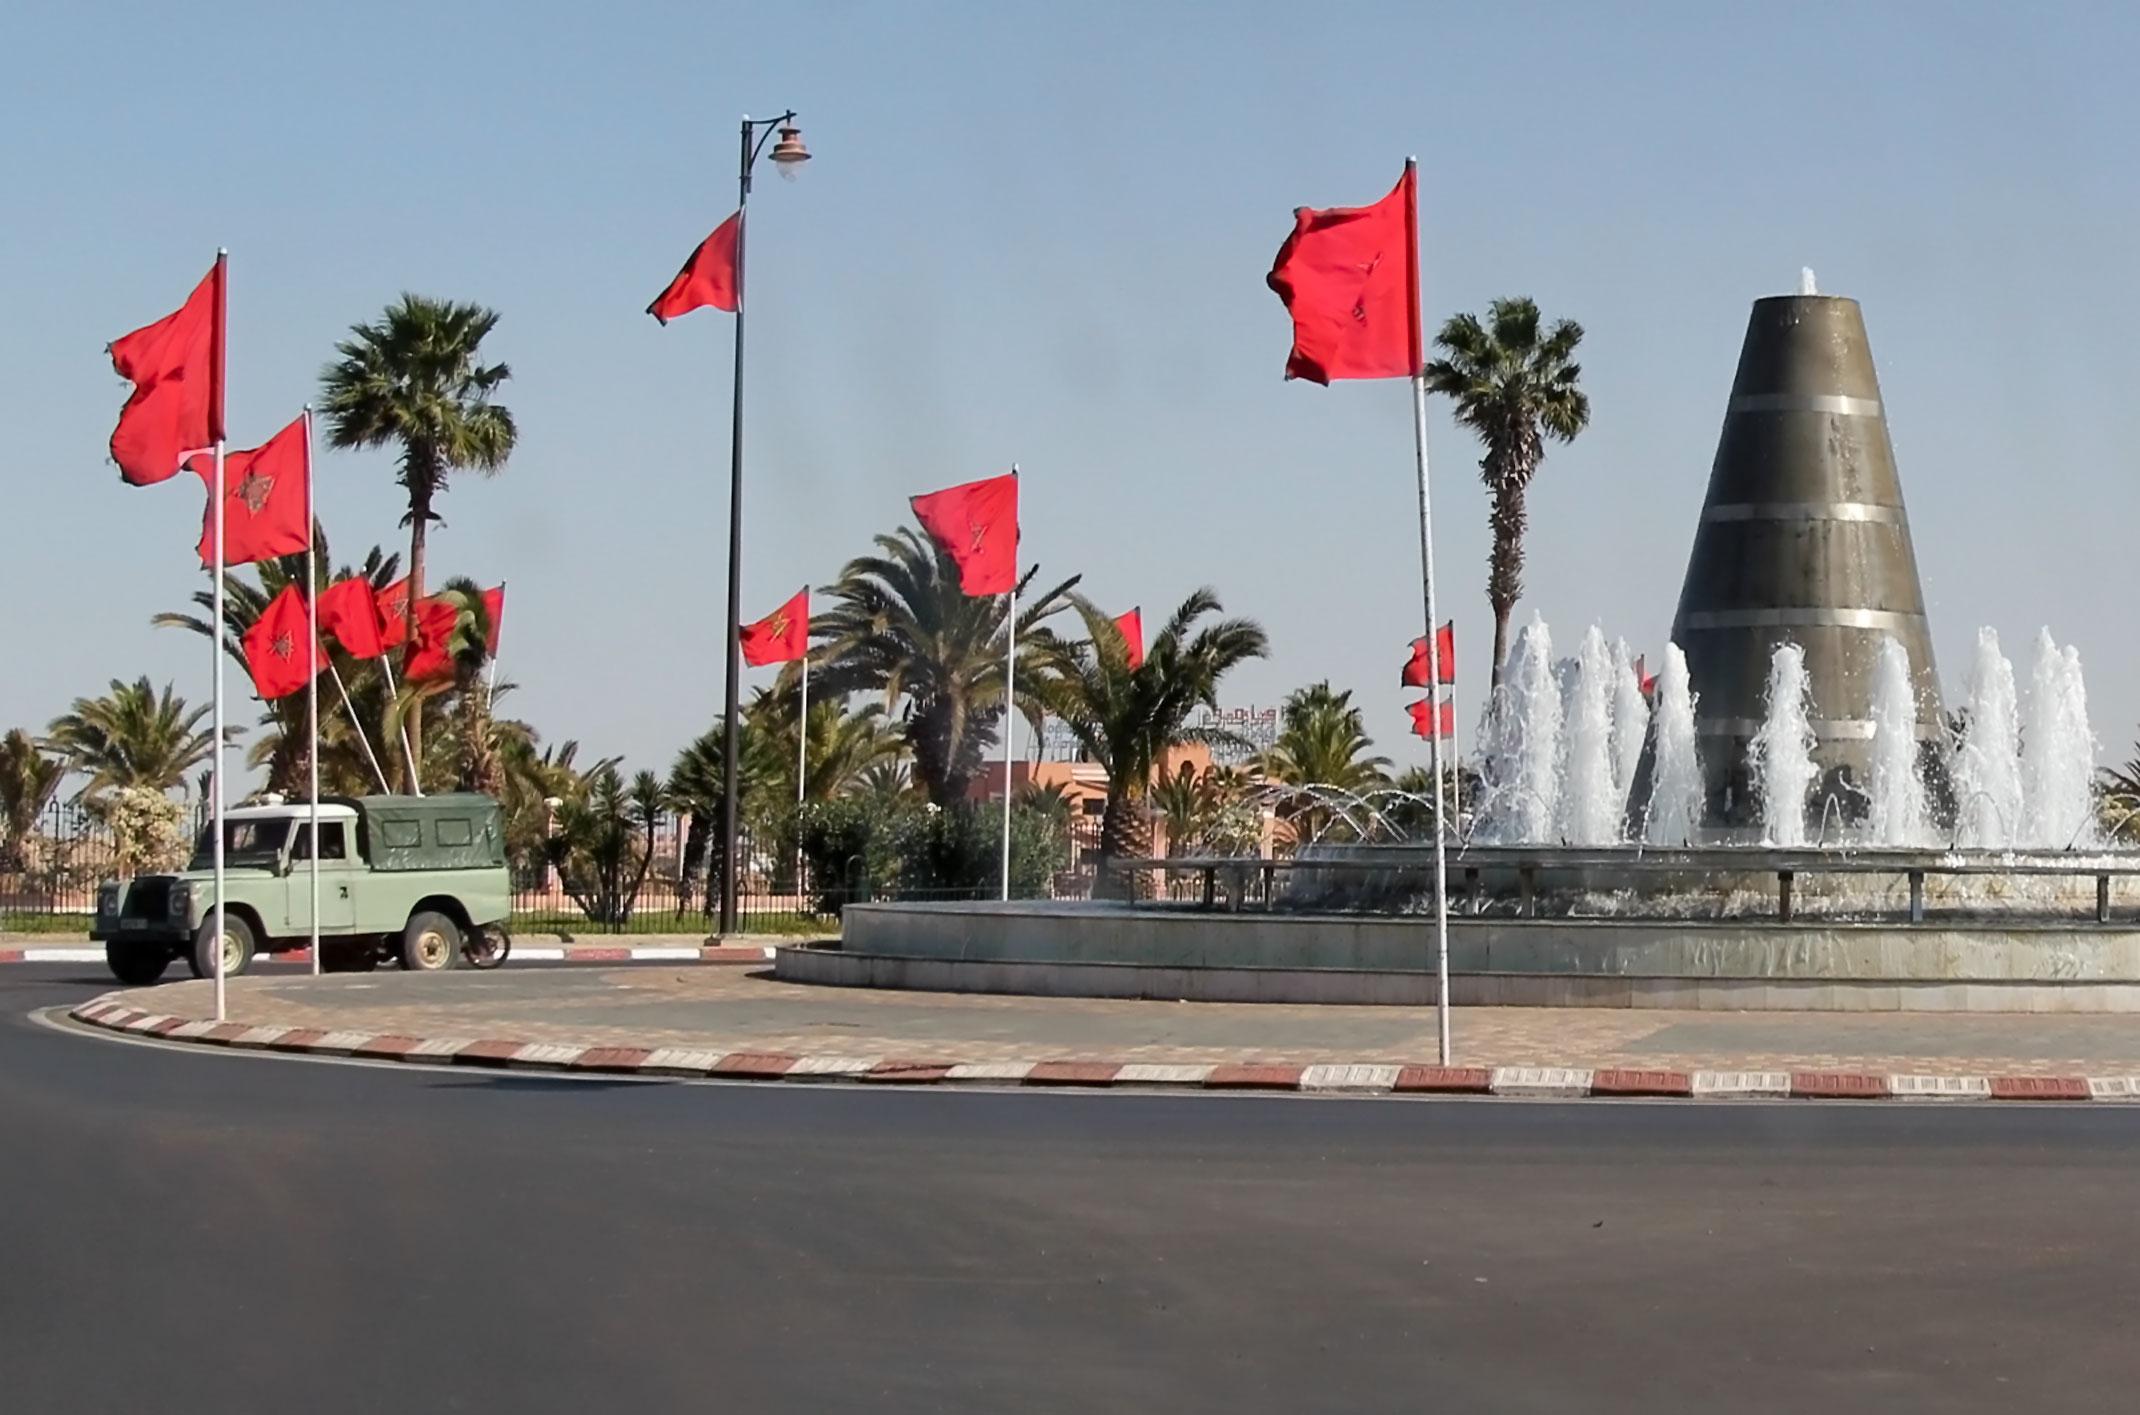 Al-Ujun-Laayoune